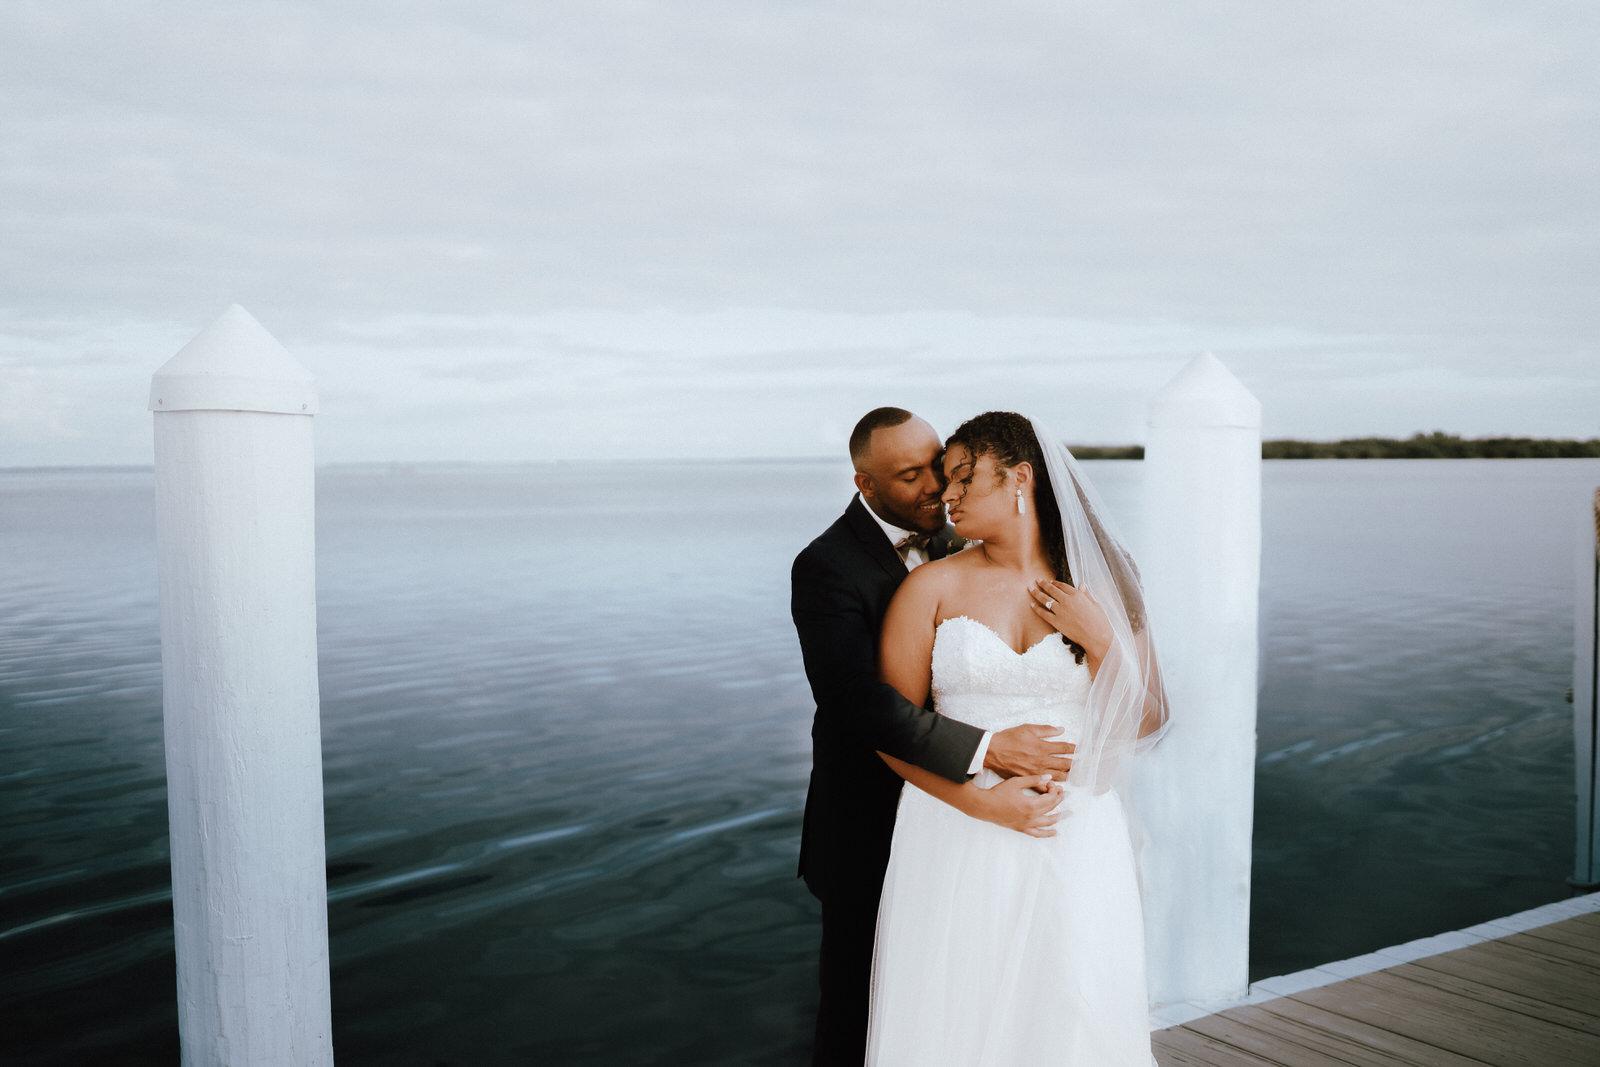 South Seas Island Resort Elopement- Alyana and Shawn- Michelle Gonzalez Photography-397.JPG